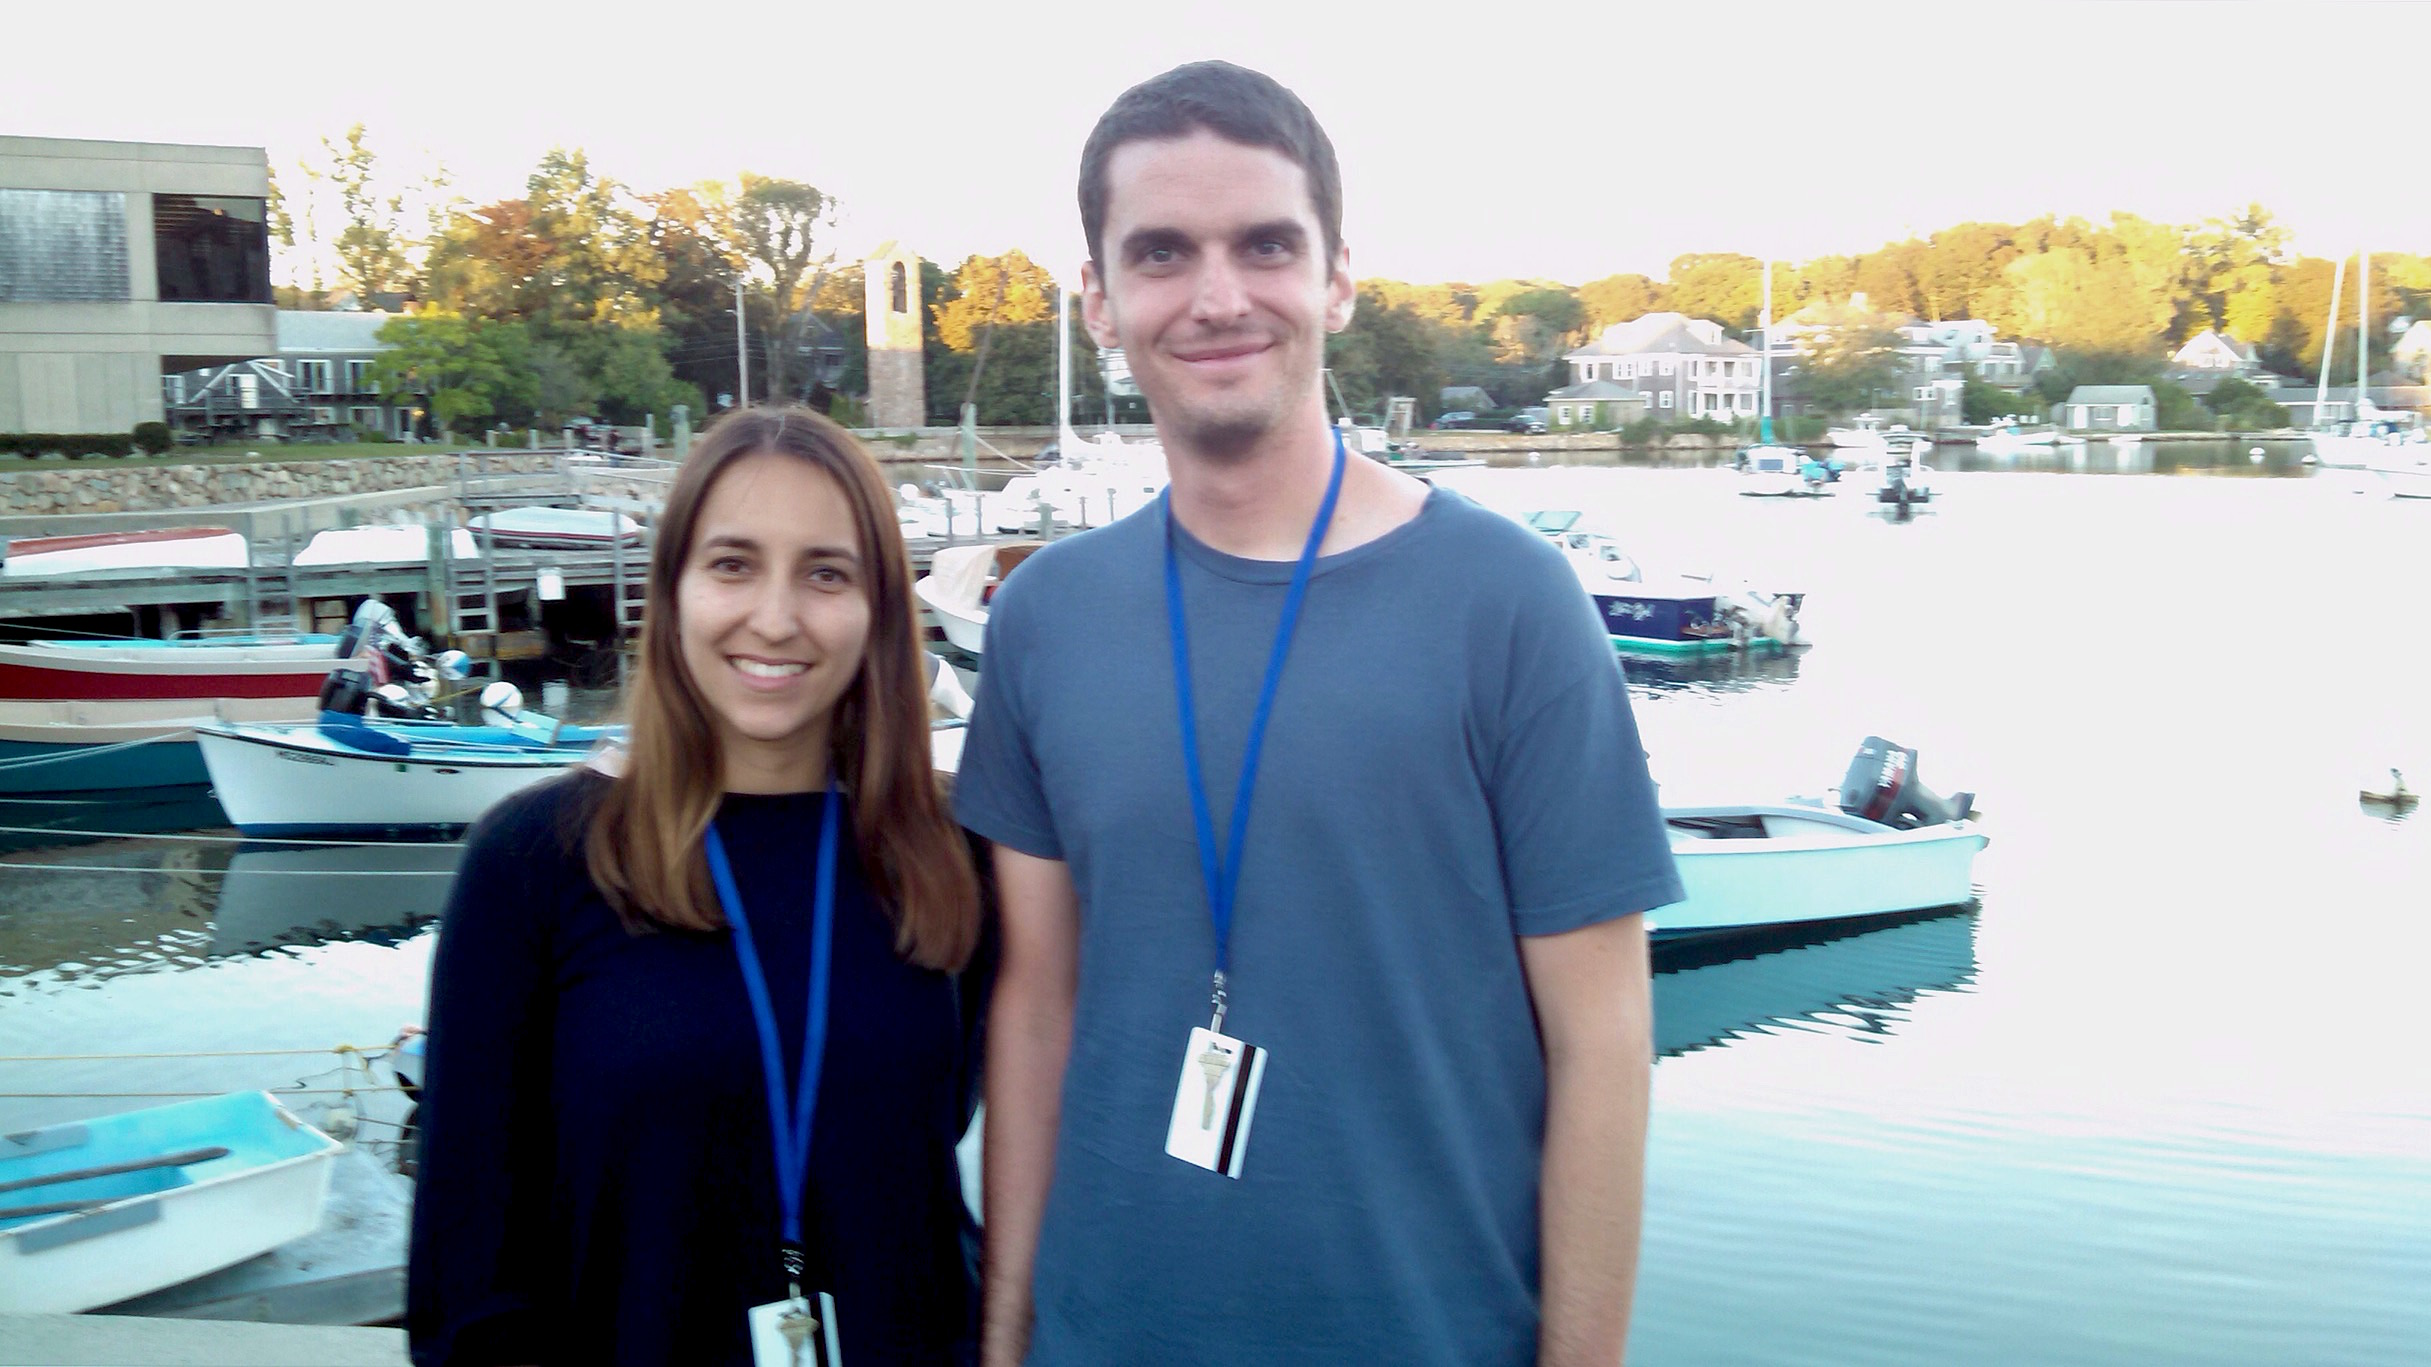 Filipa Ferreira and Tony Szempruch at Woods Hole